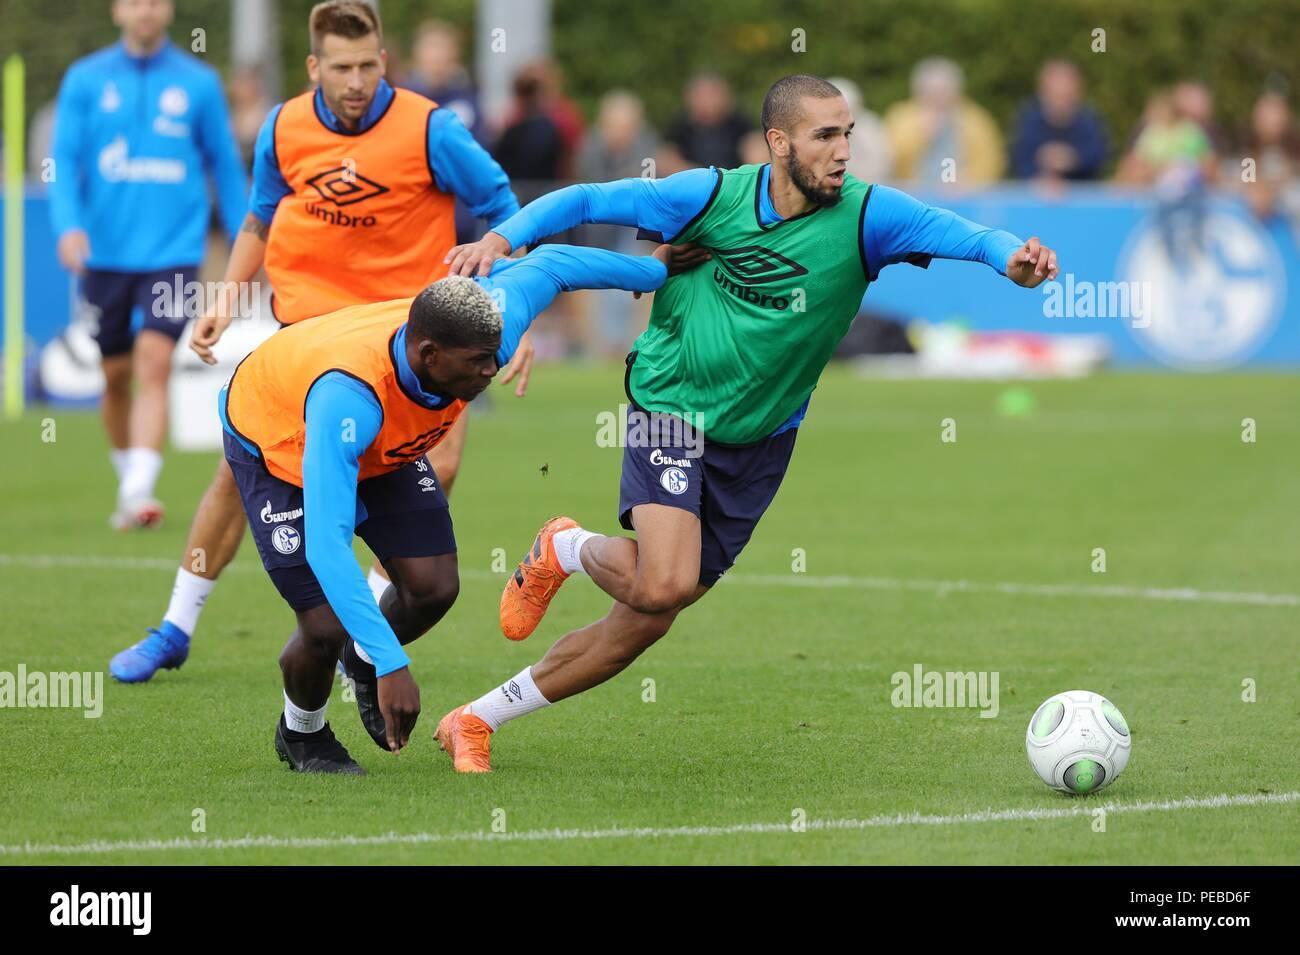 firo: 14.08.2018, football, 1.Bundesliga, season 2018/2019, FC Schalke 04, training, EMBOLO versus BENTALEB, right   usage worldwide - Stock Image